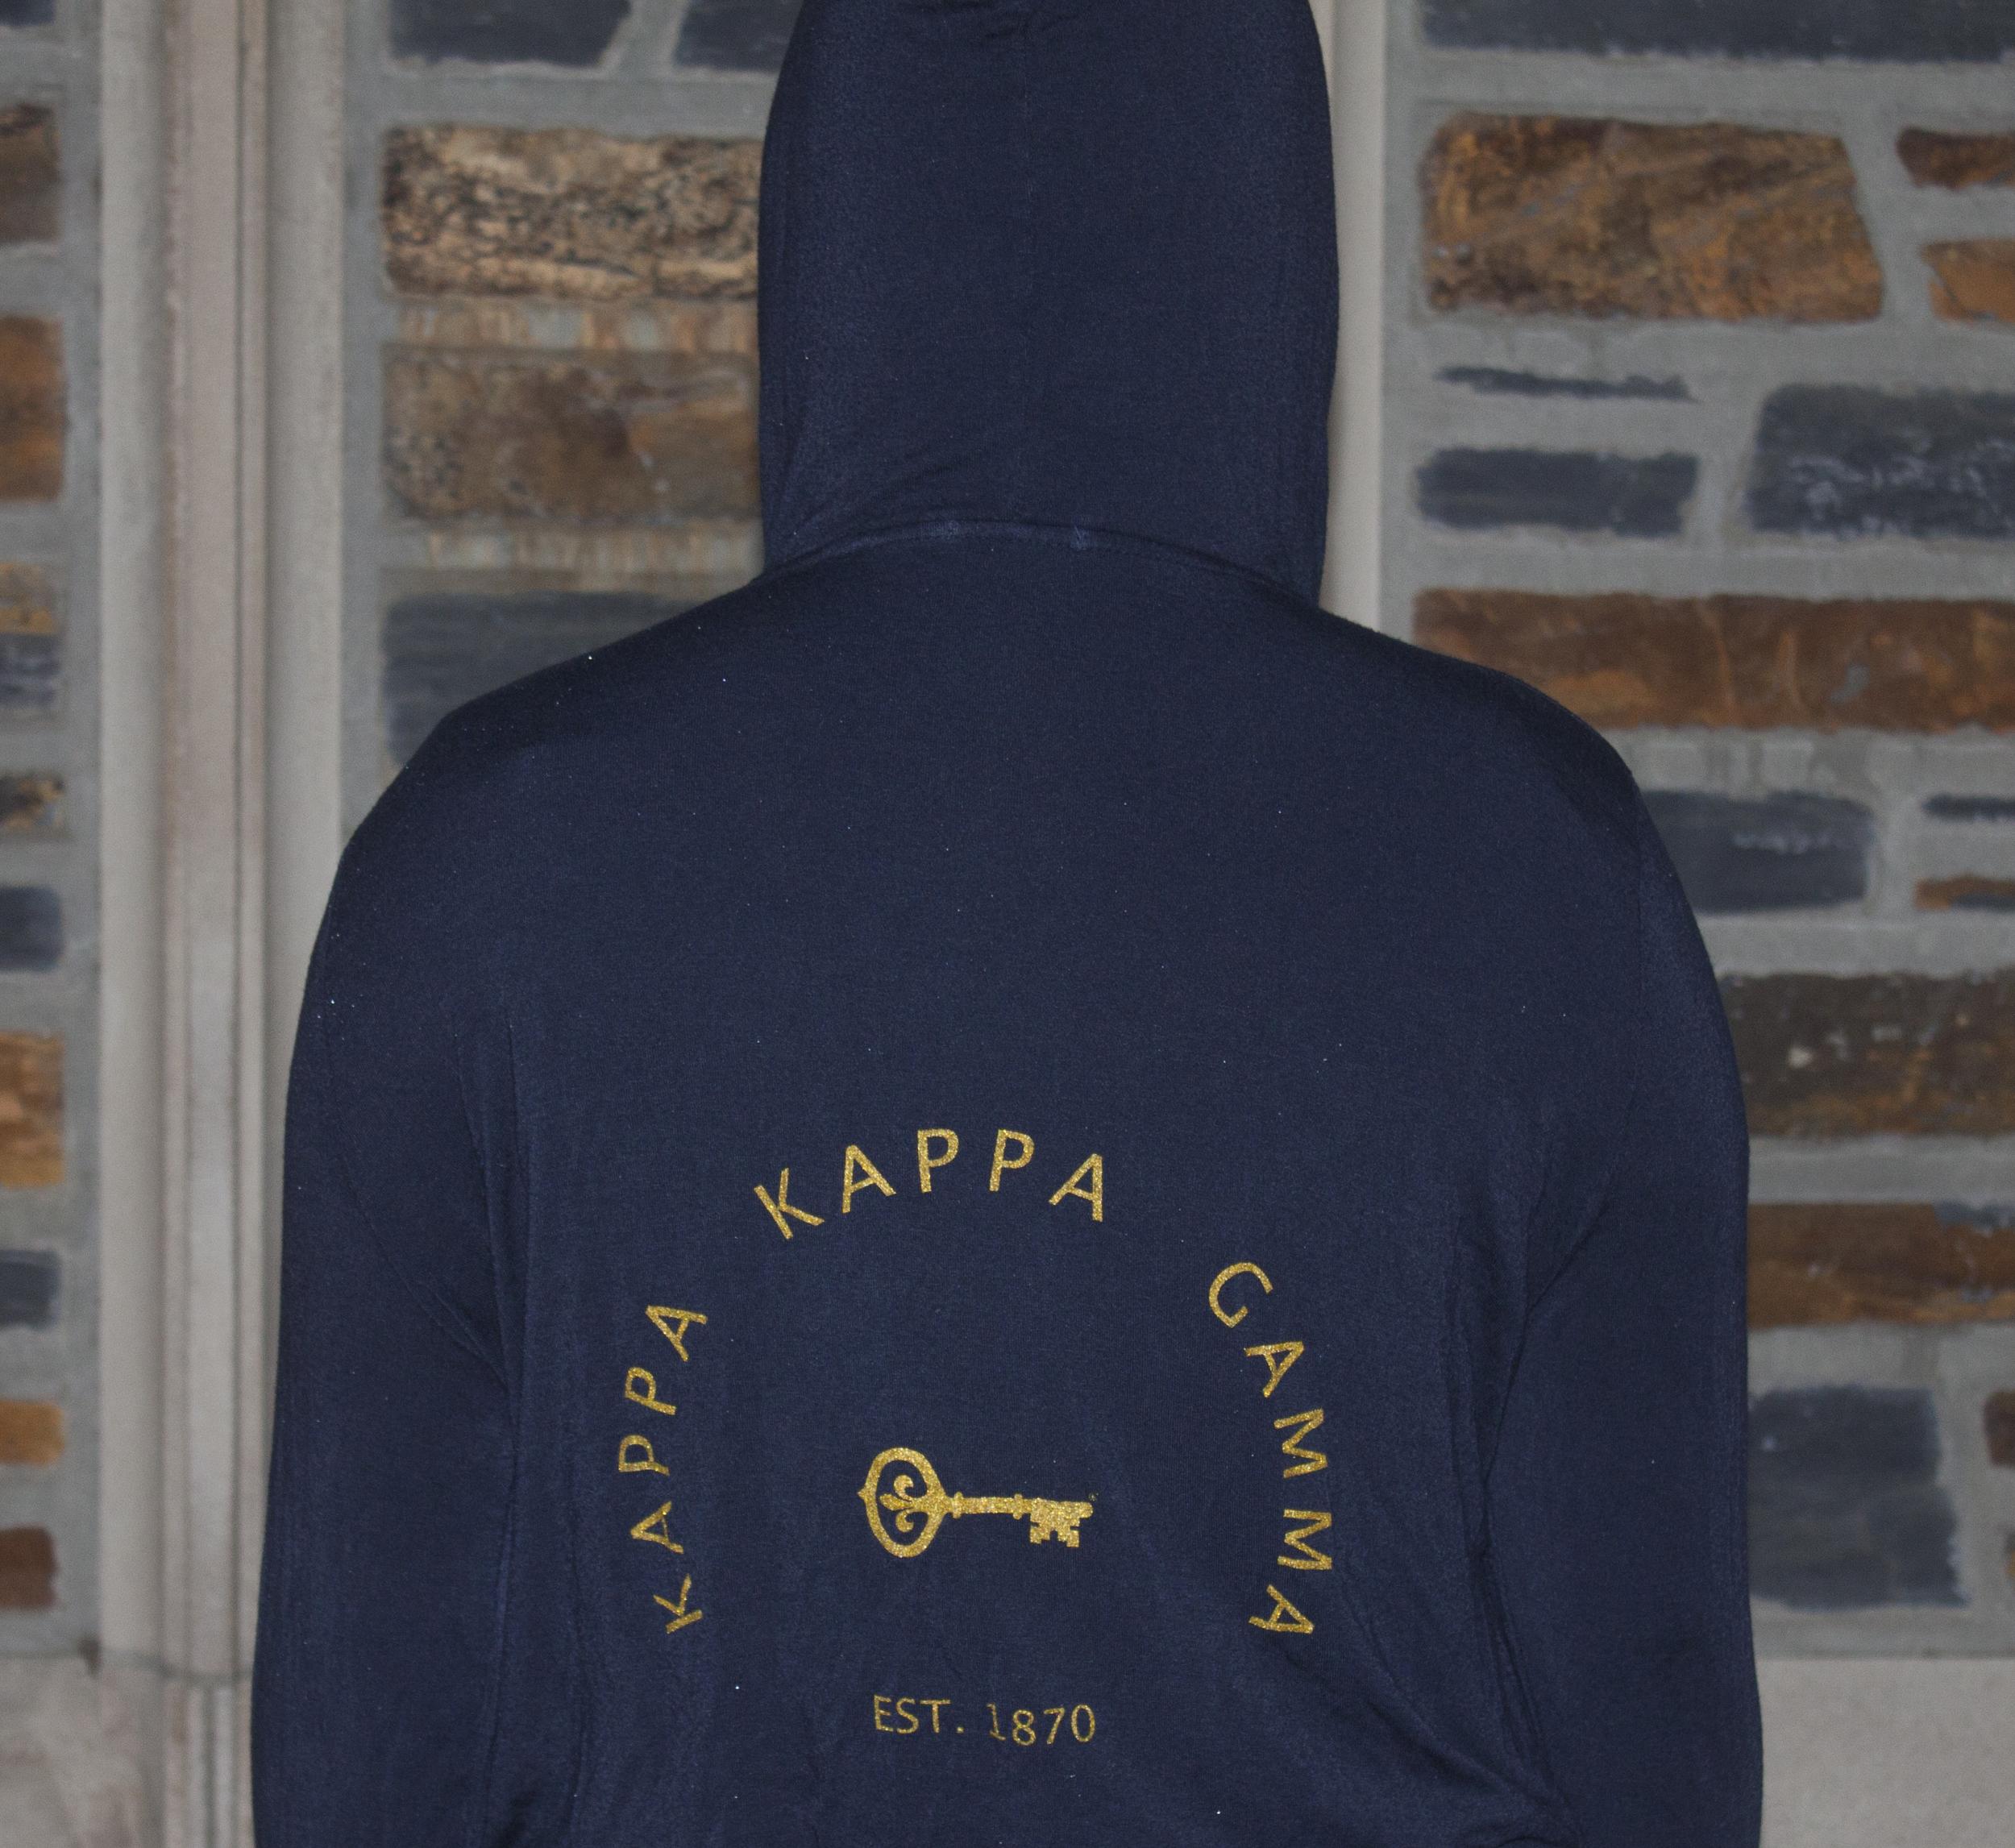 KAPPA3 - Copy.jpg